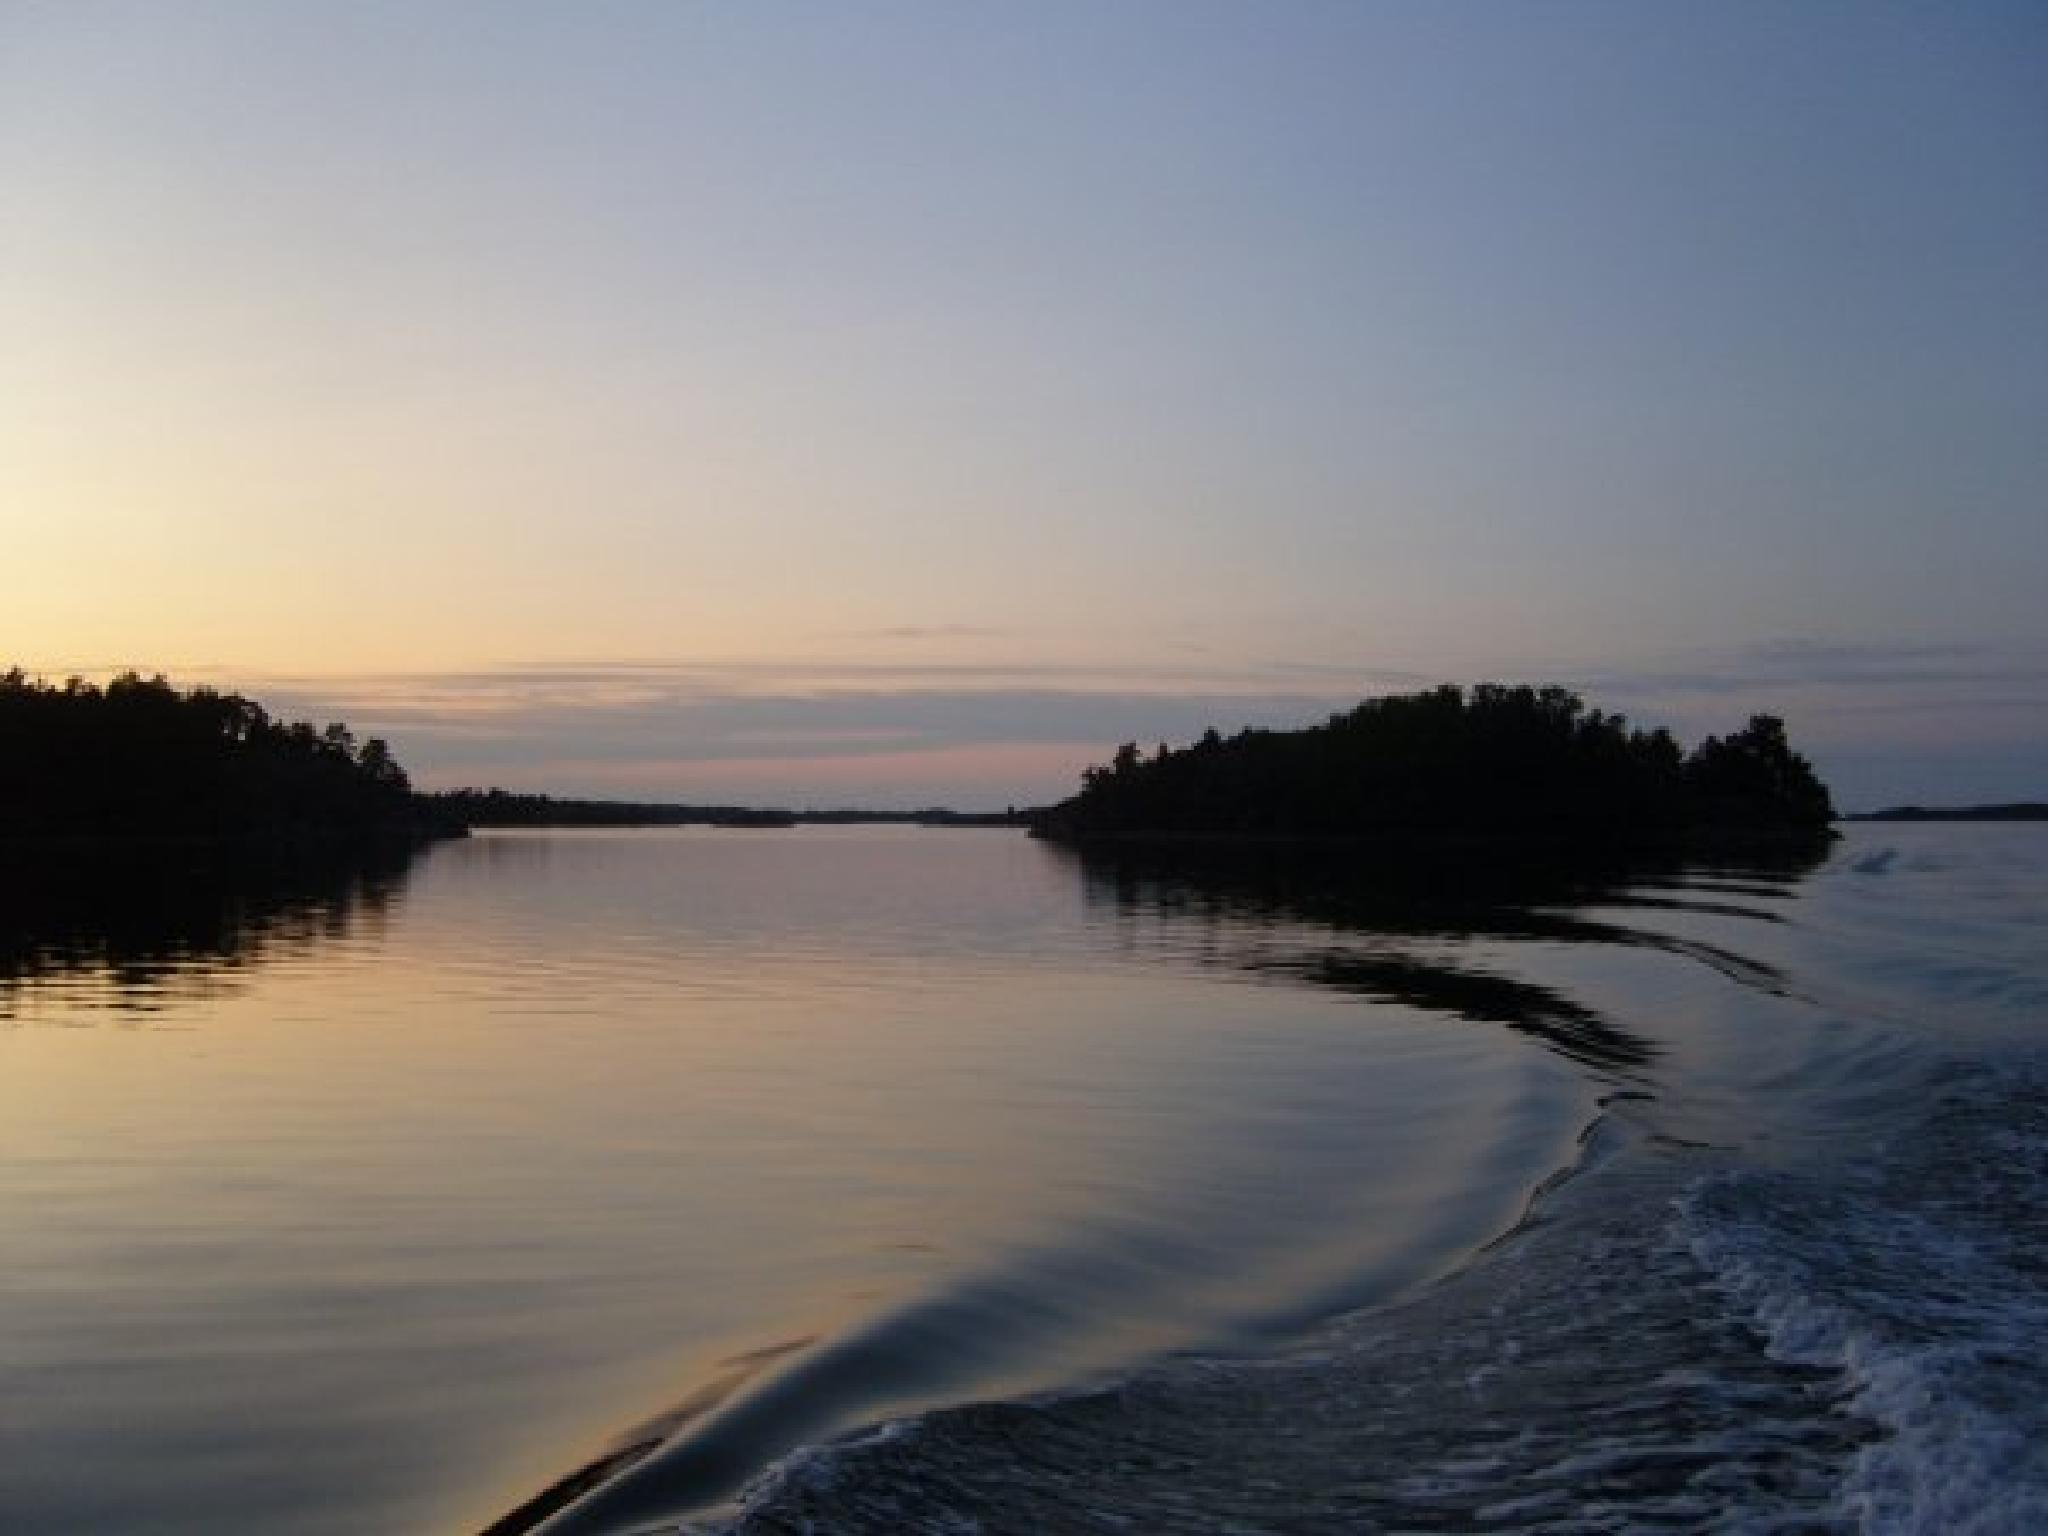 Gryts archipelago, Östergötland, Sweden by Pia Löfgren